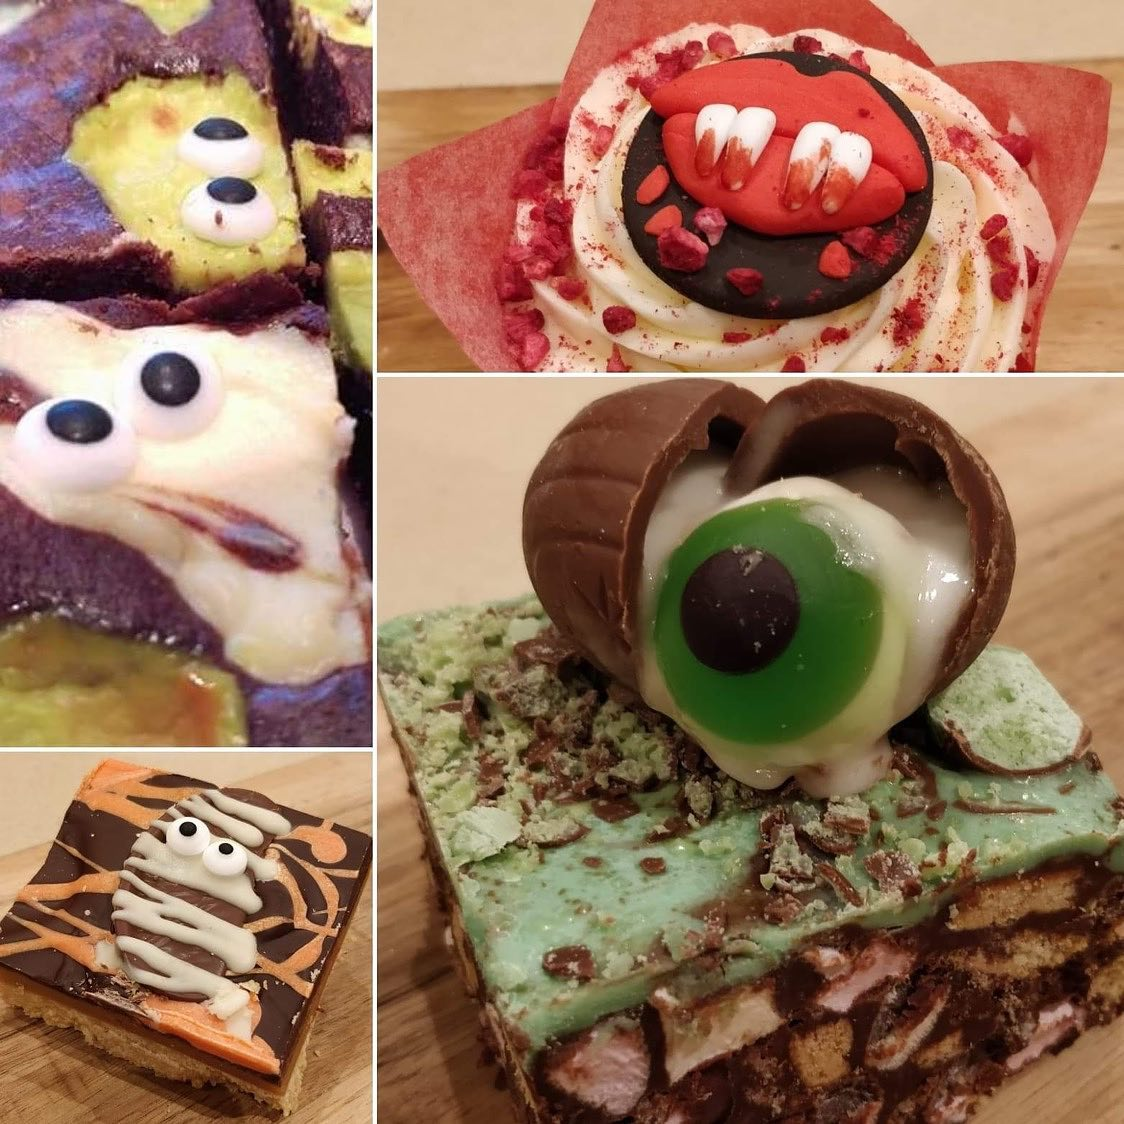 Halloween cakes at News & Deli